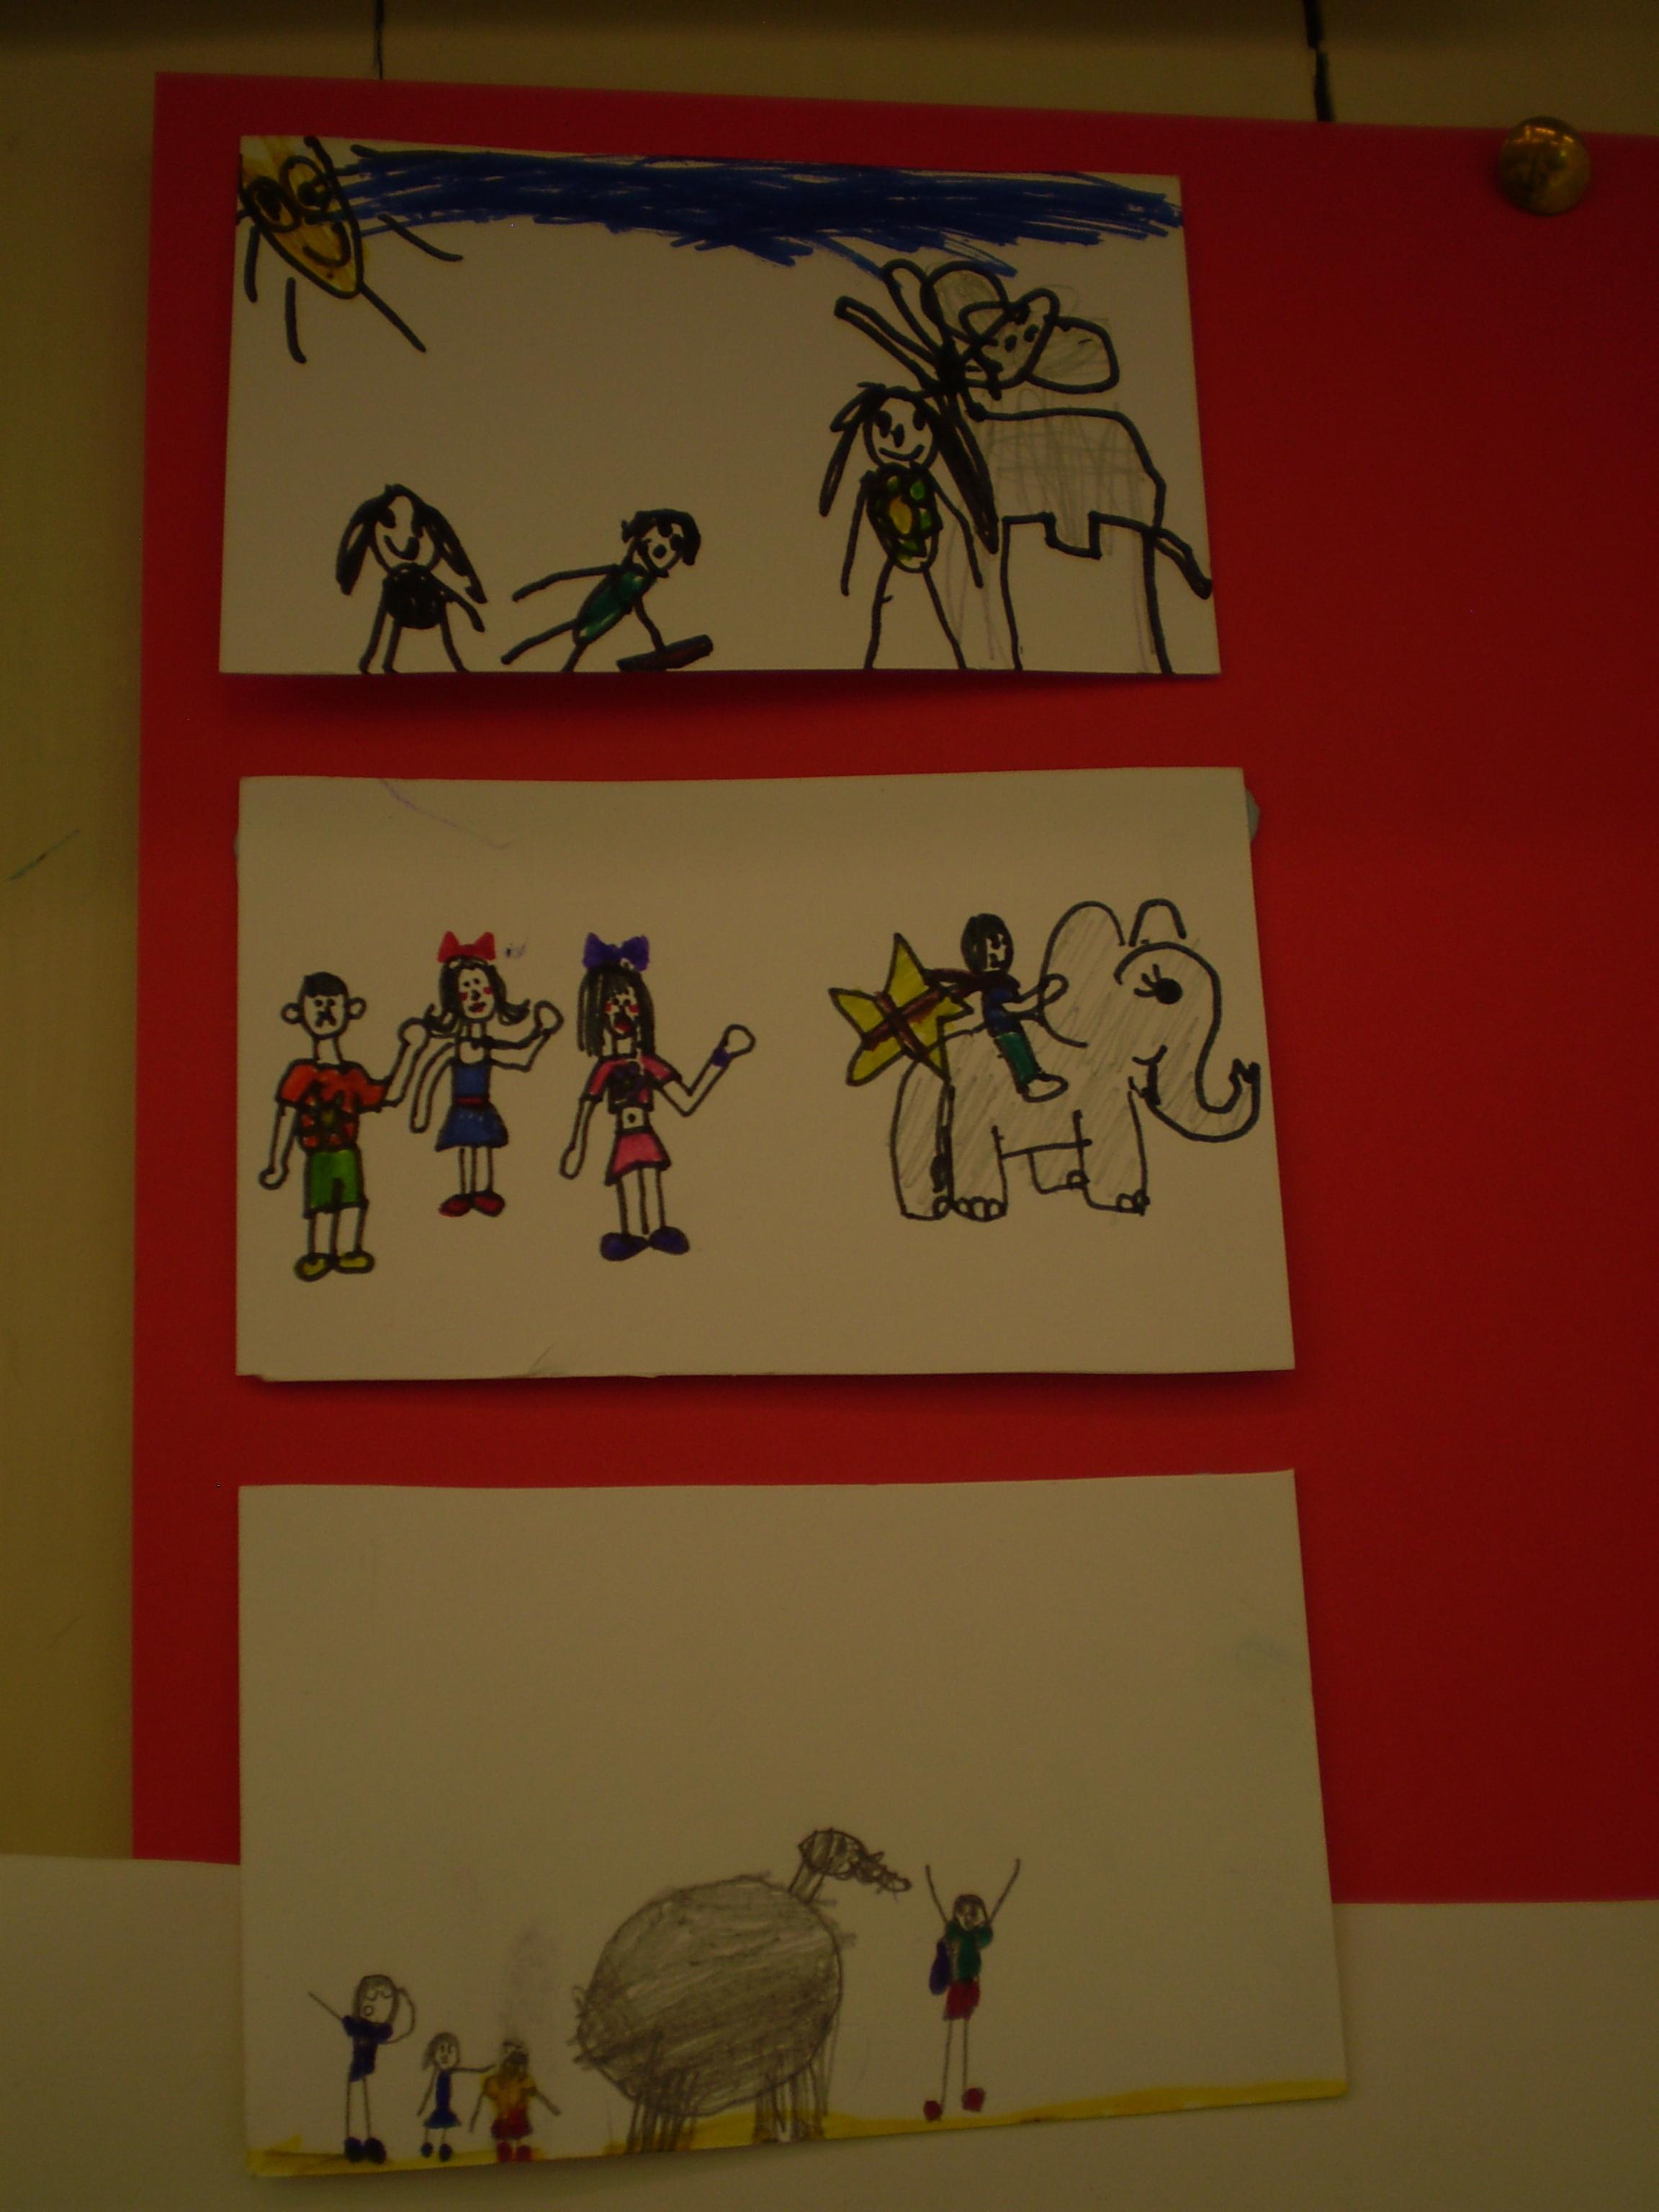 Storyboard from Dublin City Council's Children's Art